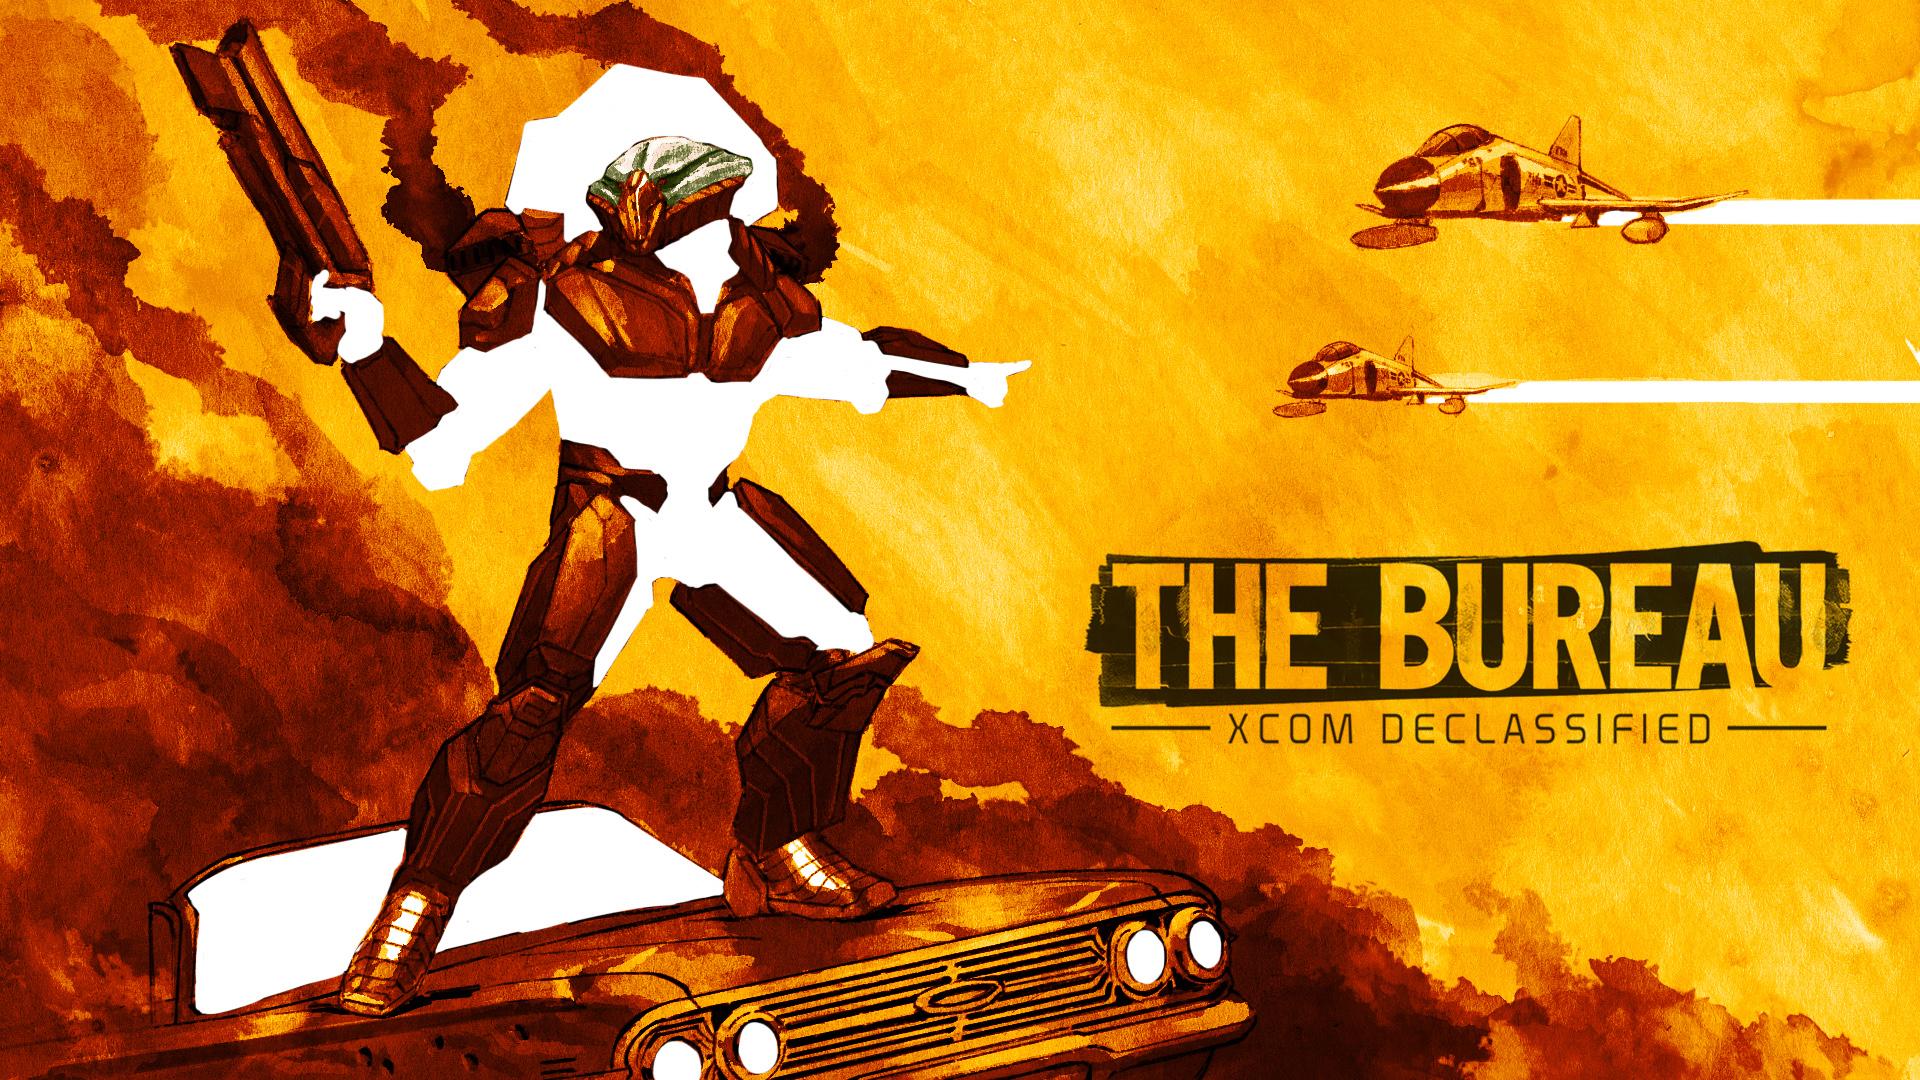 Image The Bureau XCOM Declassified Artwork 3jpg Steam Trading